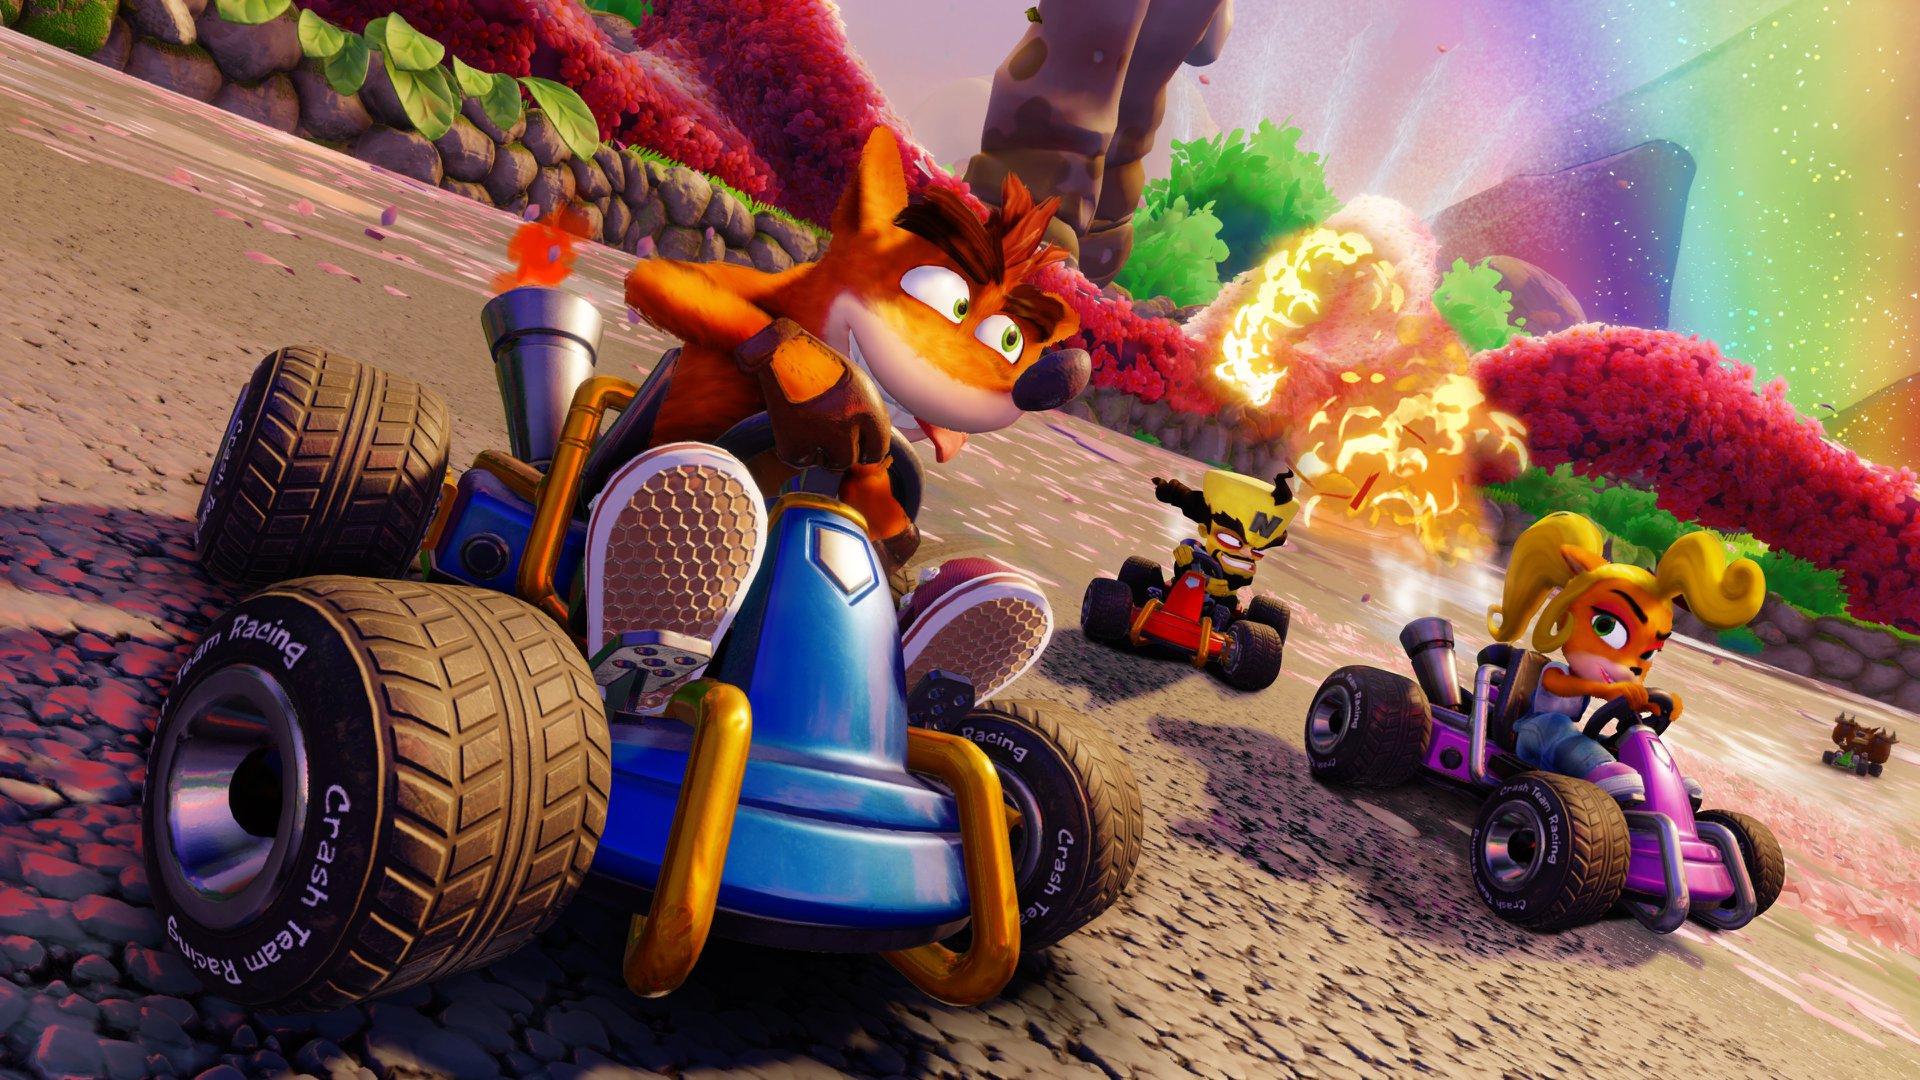 Contenuti rétro per la versione PS4 di Crash Team Racing Nitro-Fueled